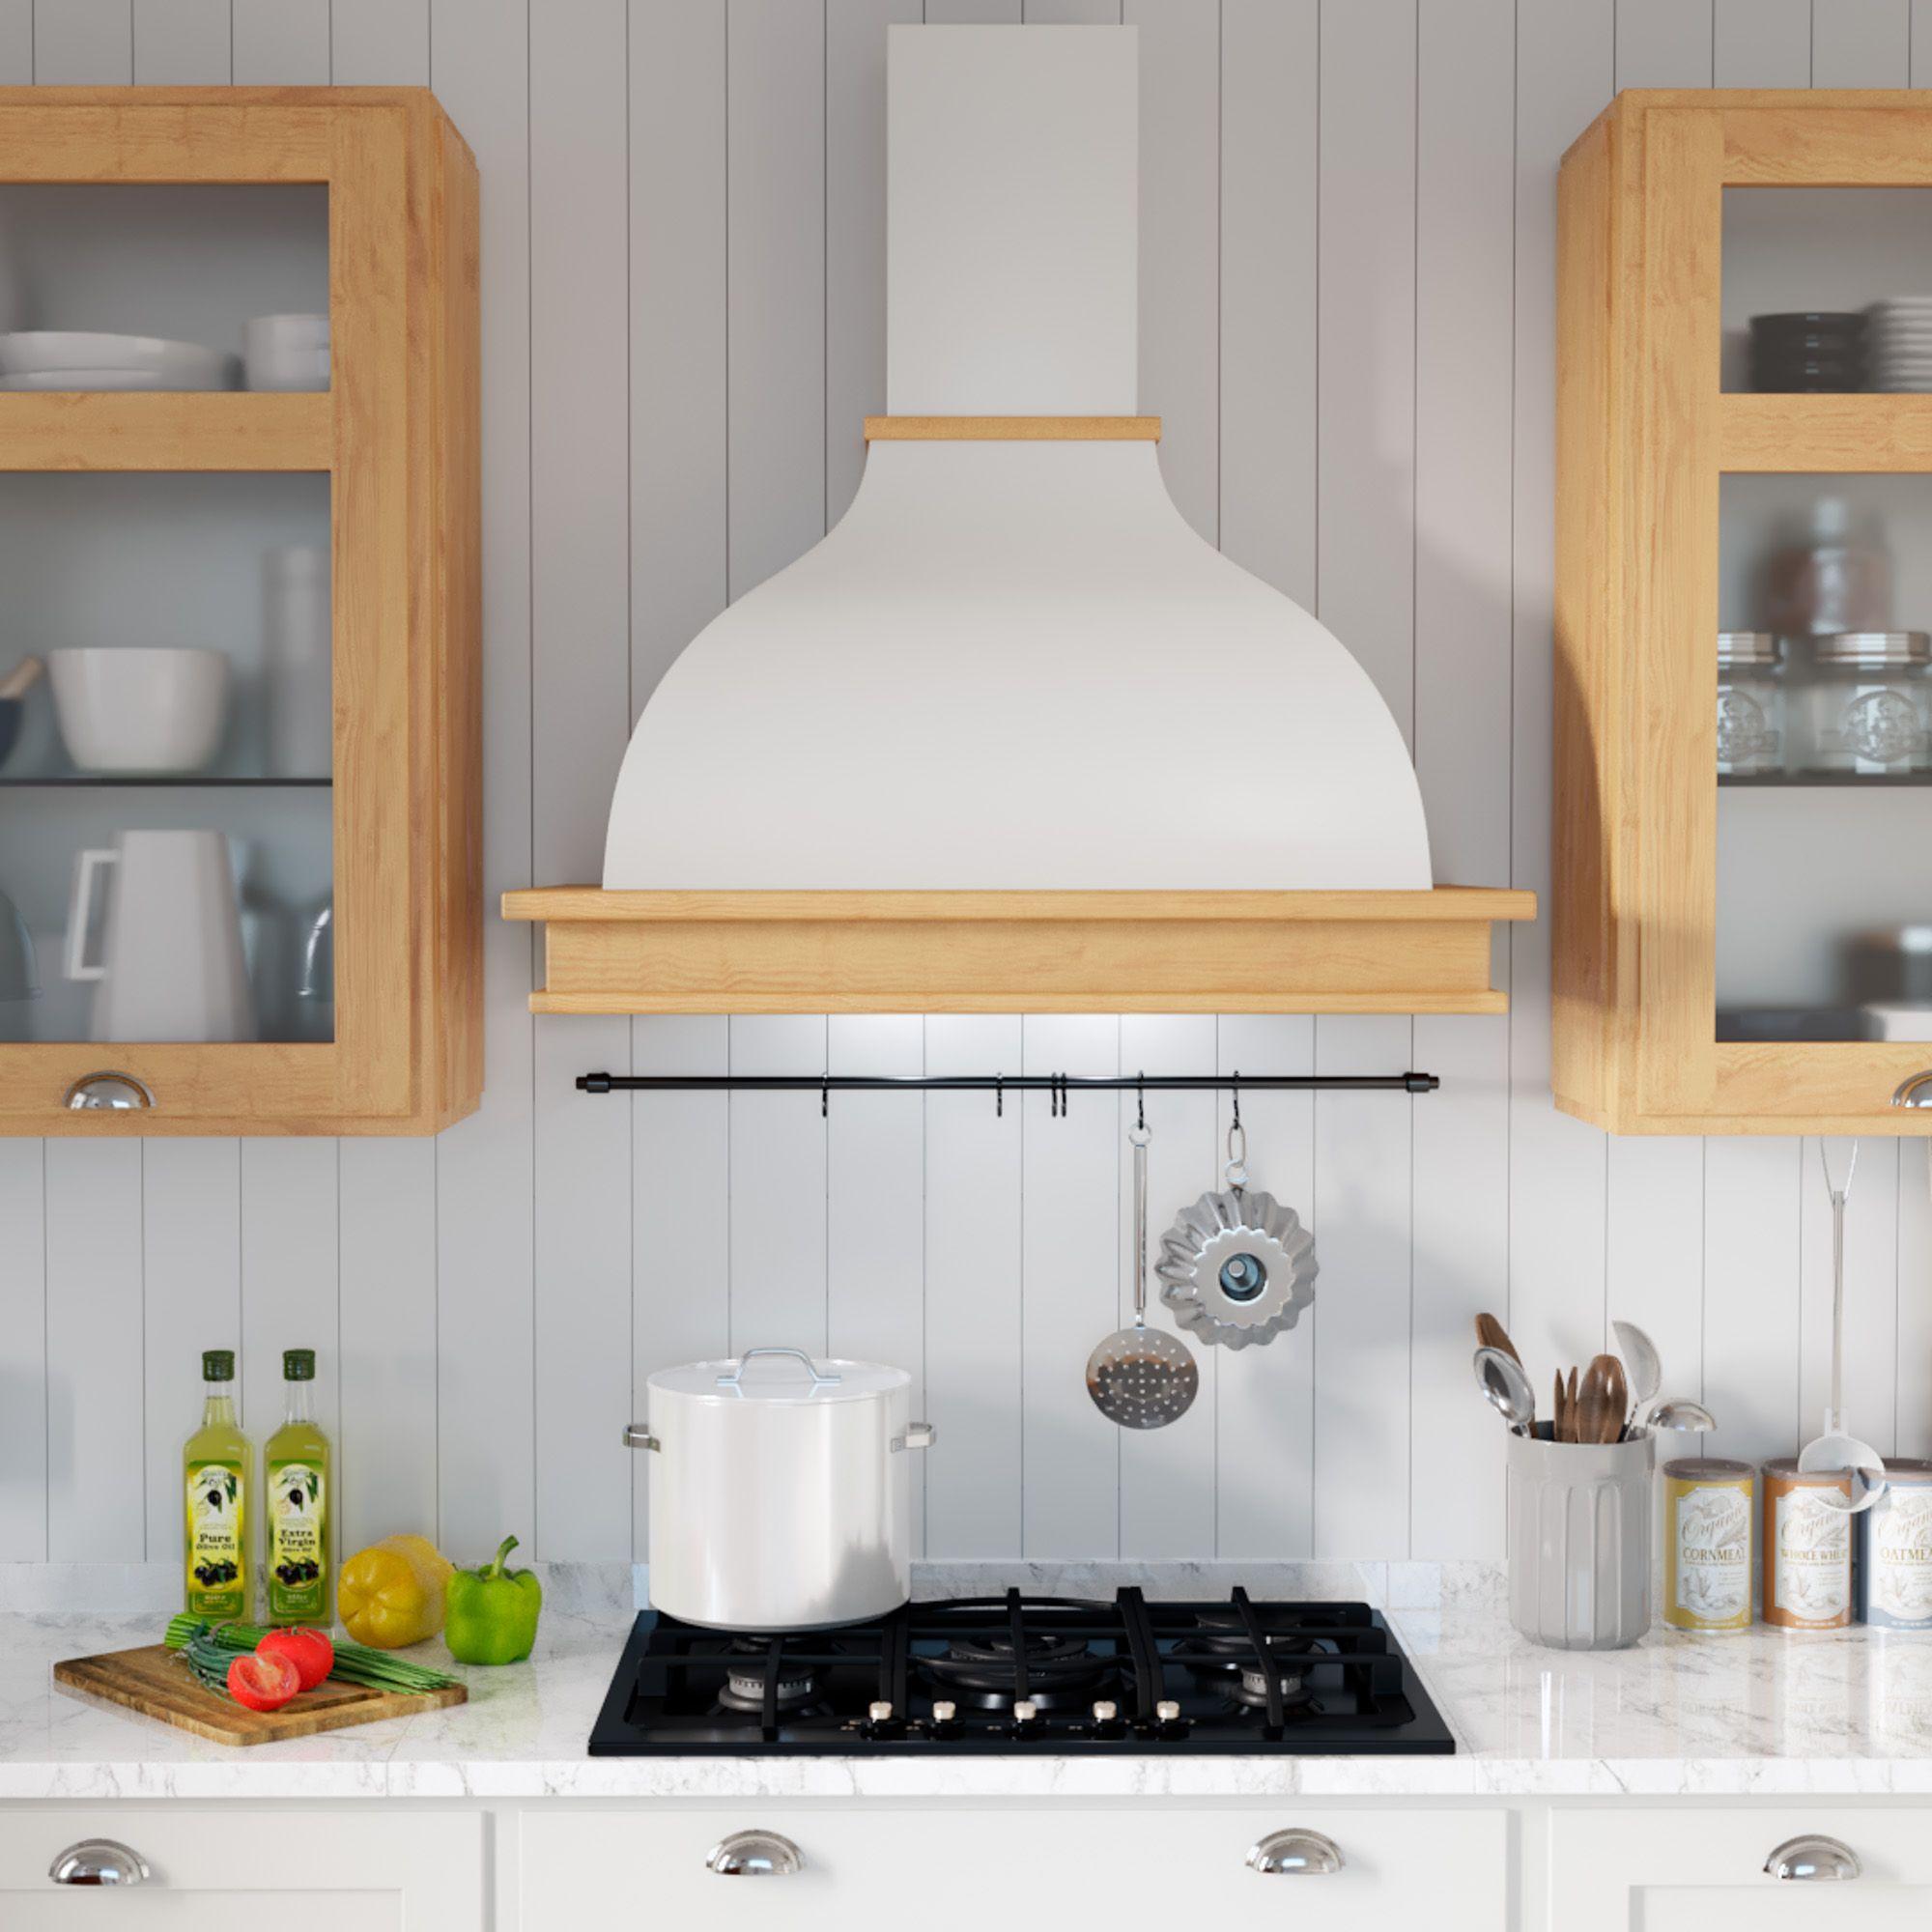 Futuro Futuro 36 Inch Massachusetts Wall Range Hood In 2020 Kitchen Design Kitchen Remodel Kitchen Hoods